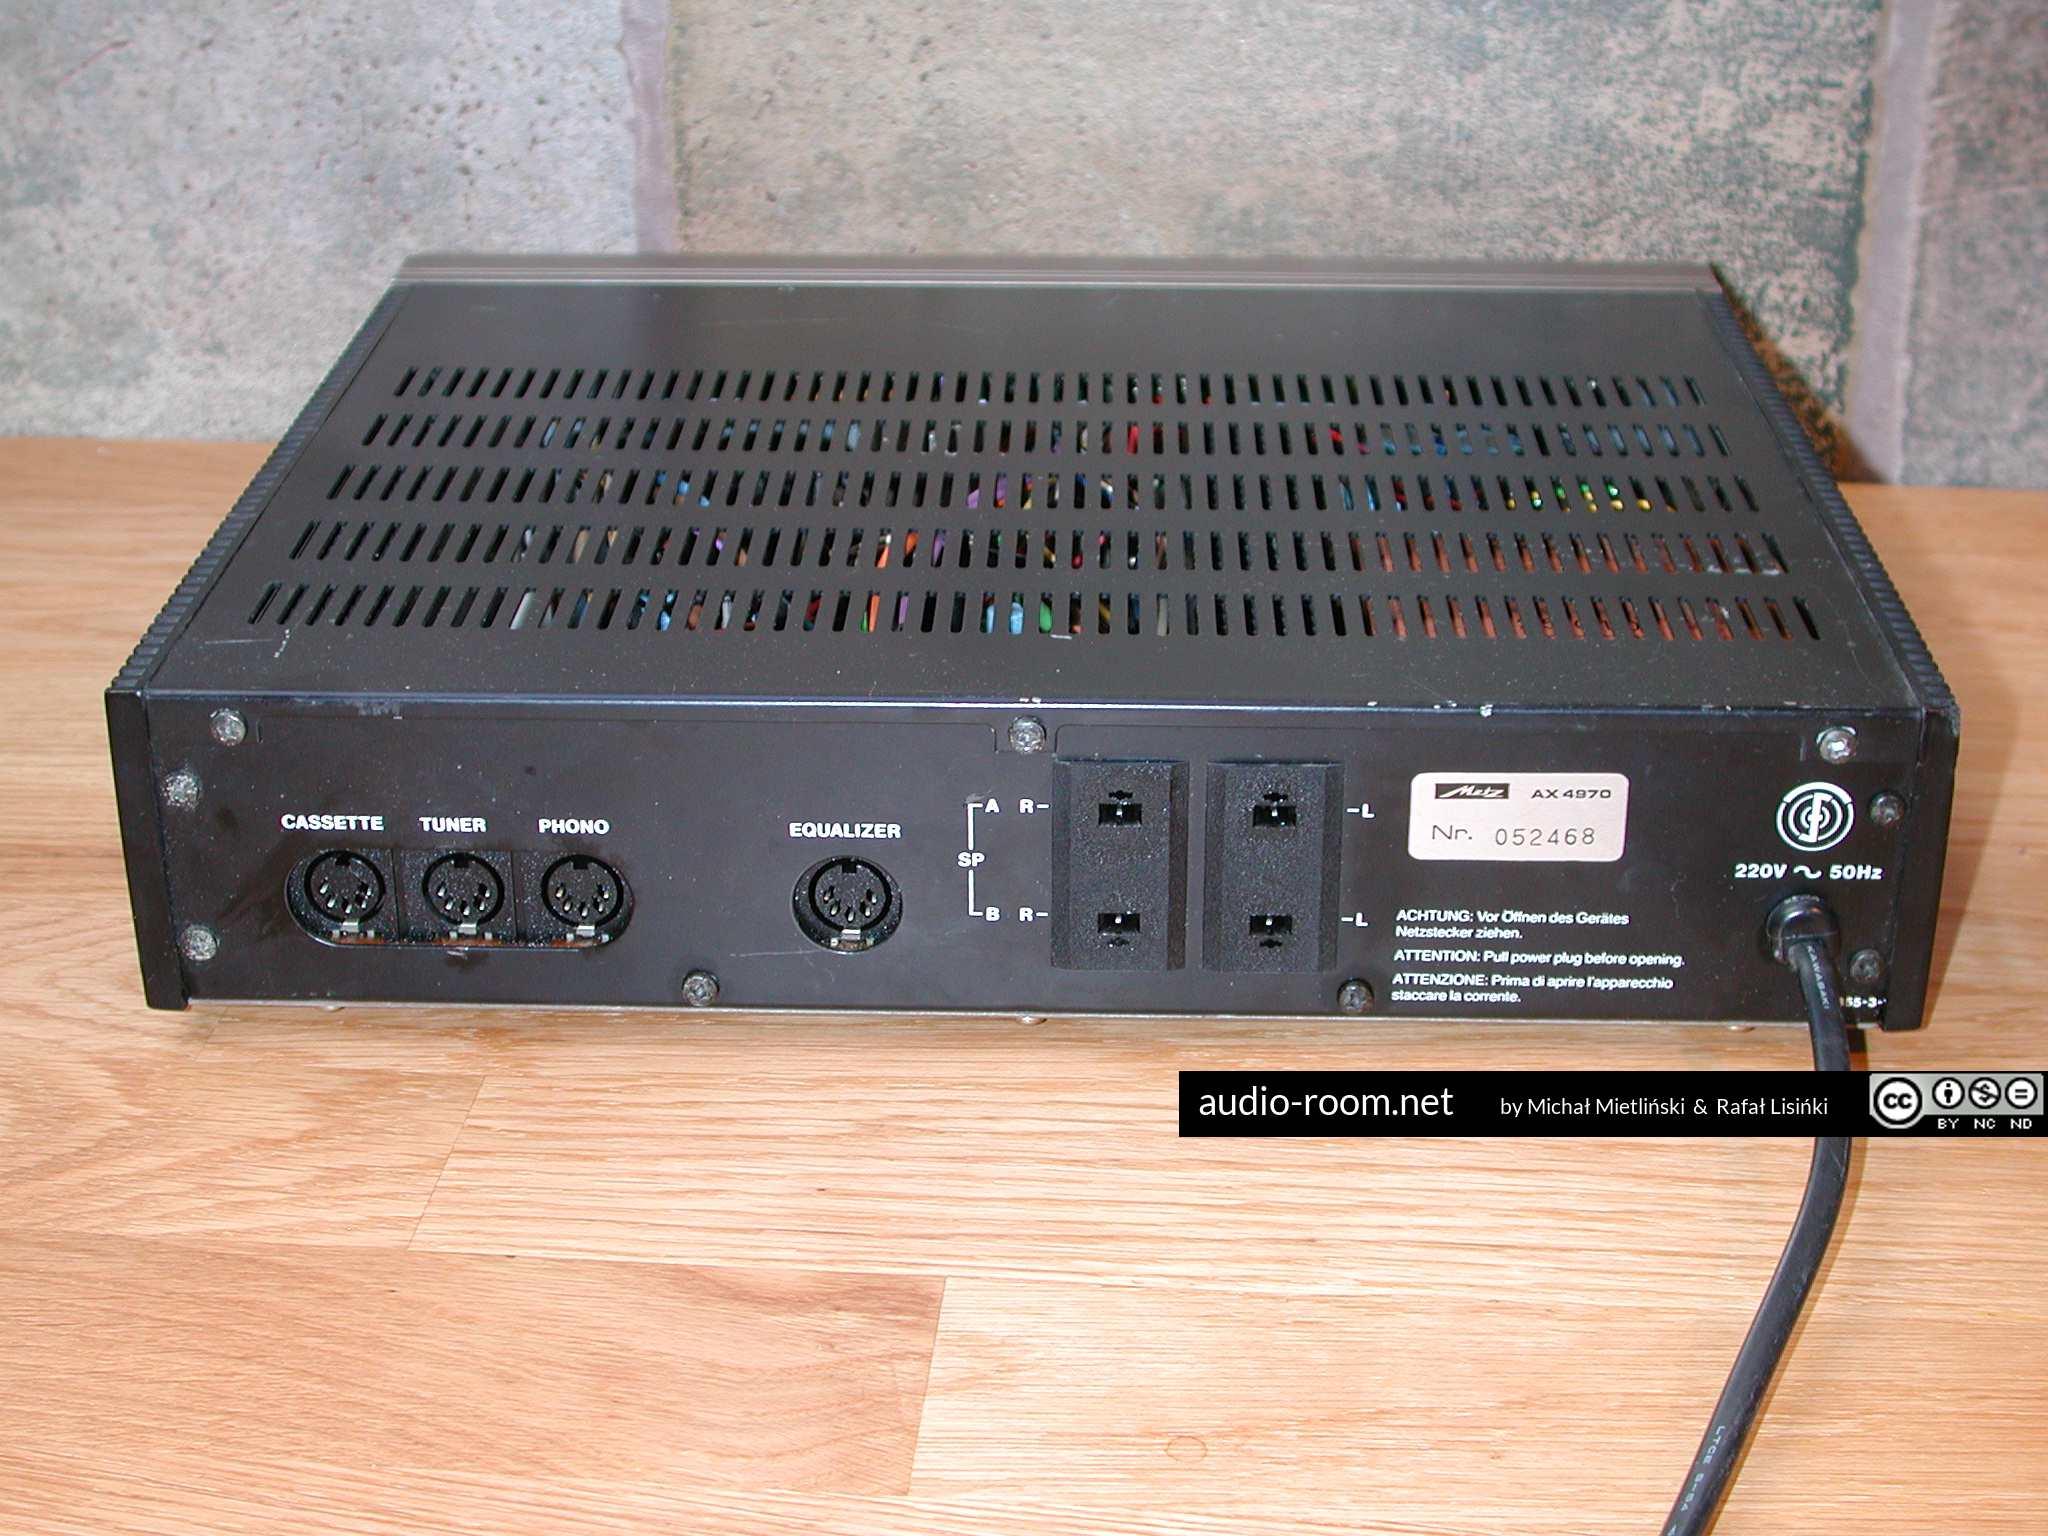 metz-ax-4970-dscn9089